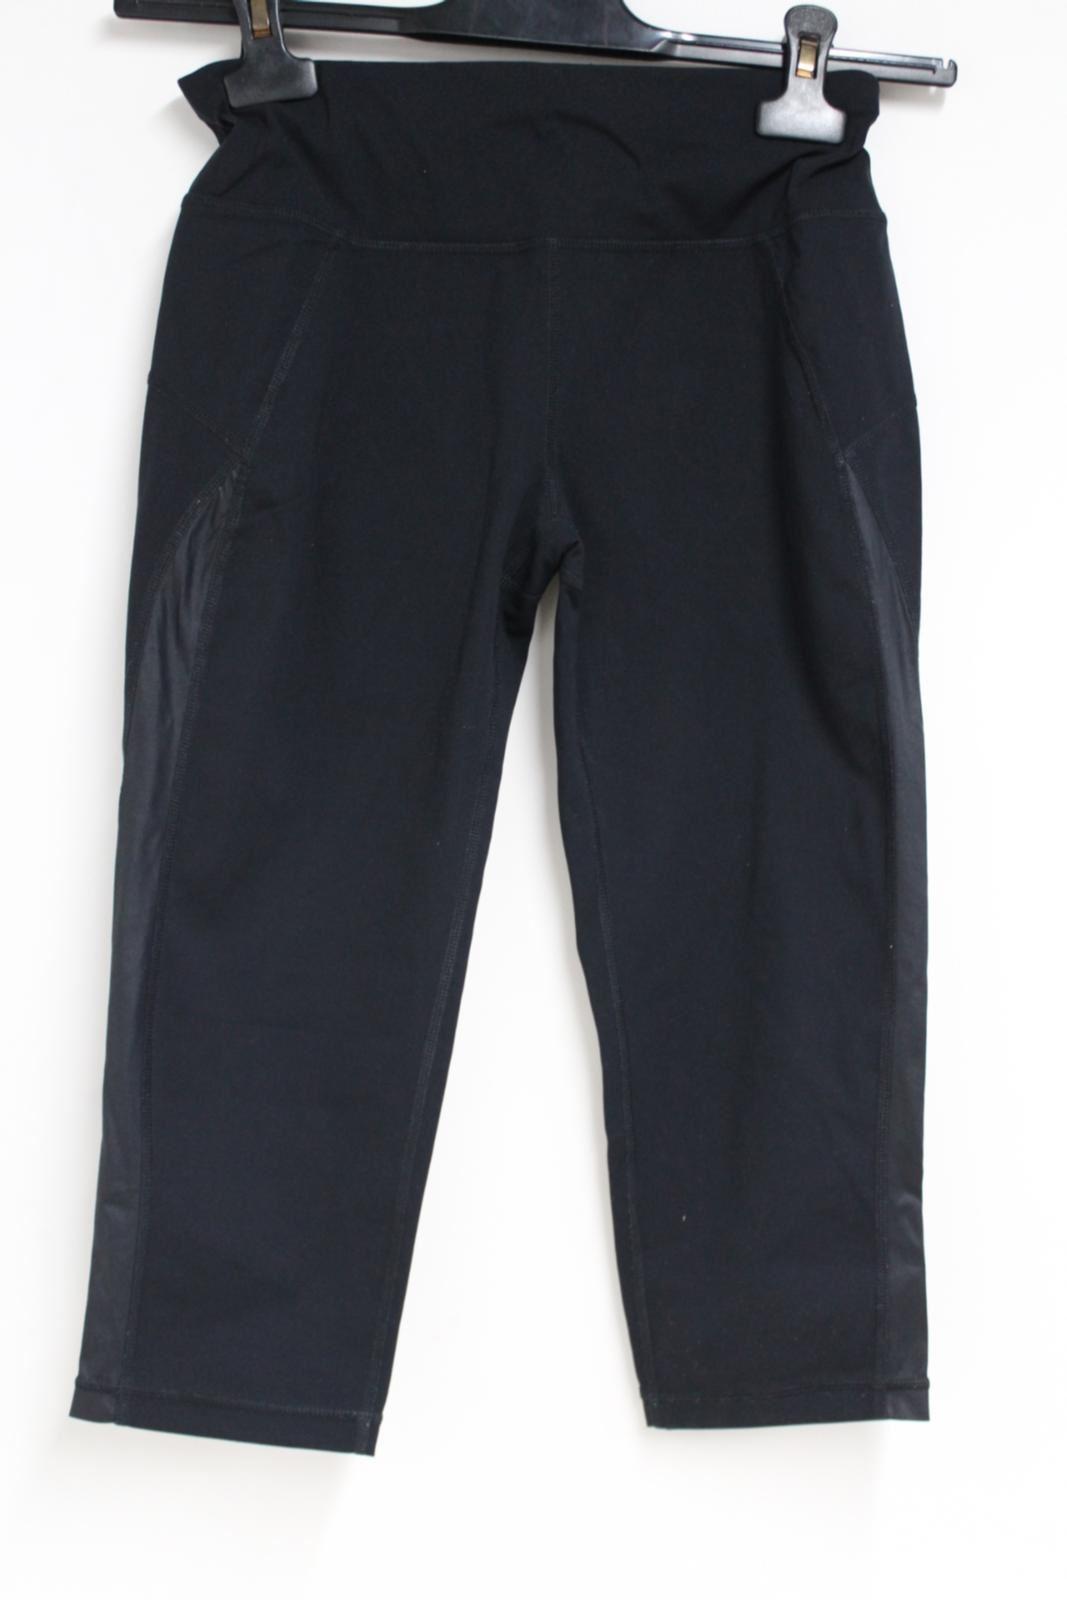 Sweaty-Betty-Ladies-Negro-3-4-piernas-Corto-Leggings-Activewear-pequeno-W26-L16